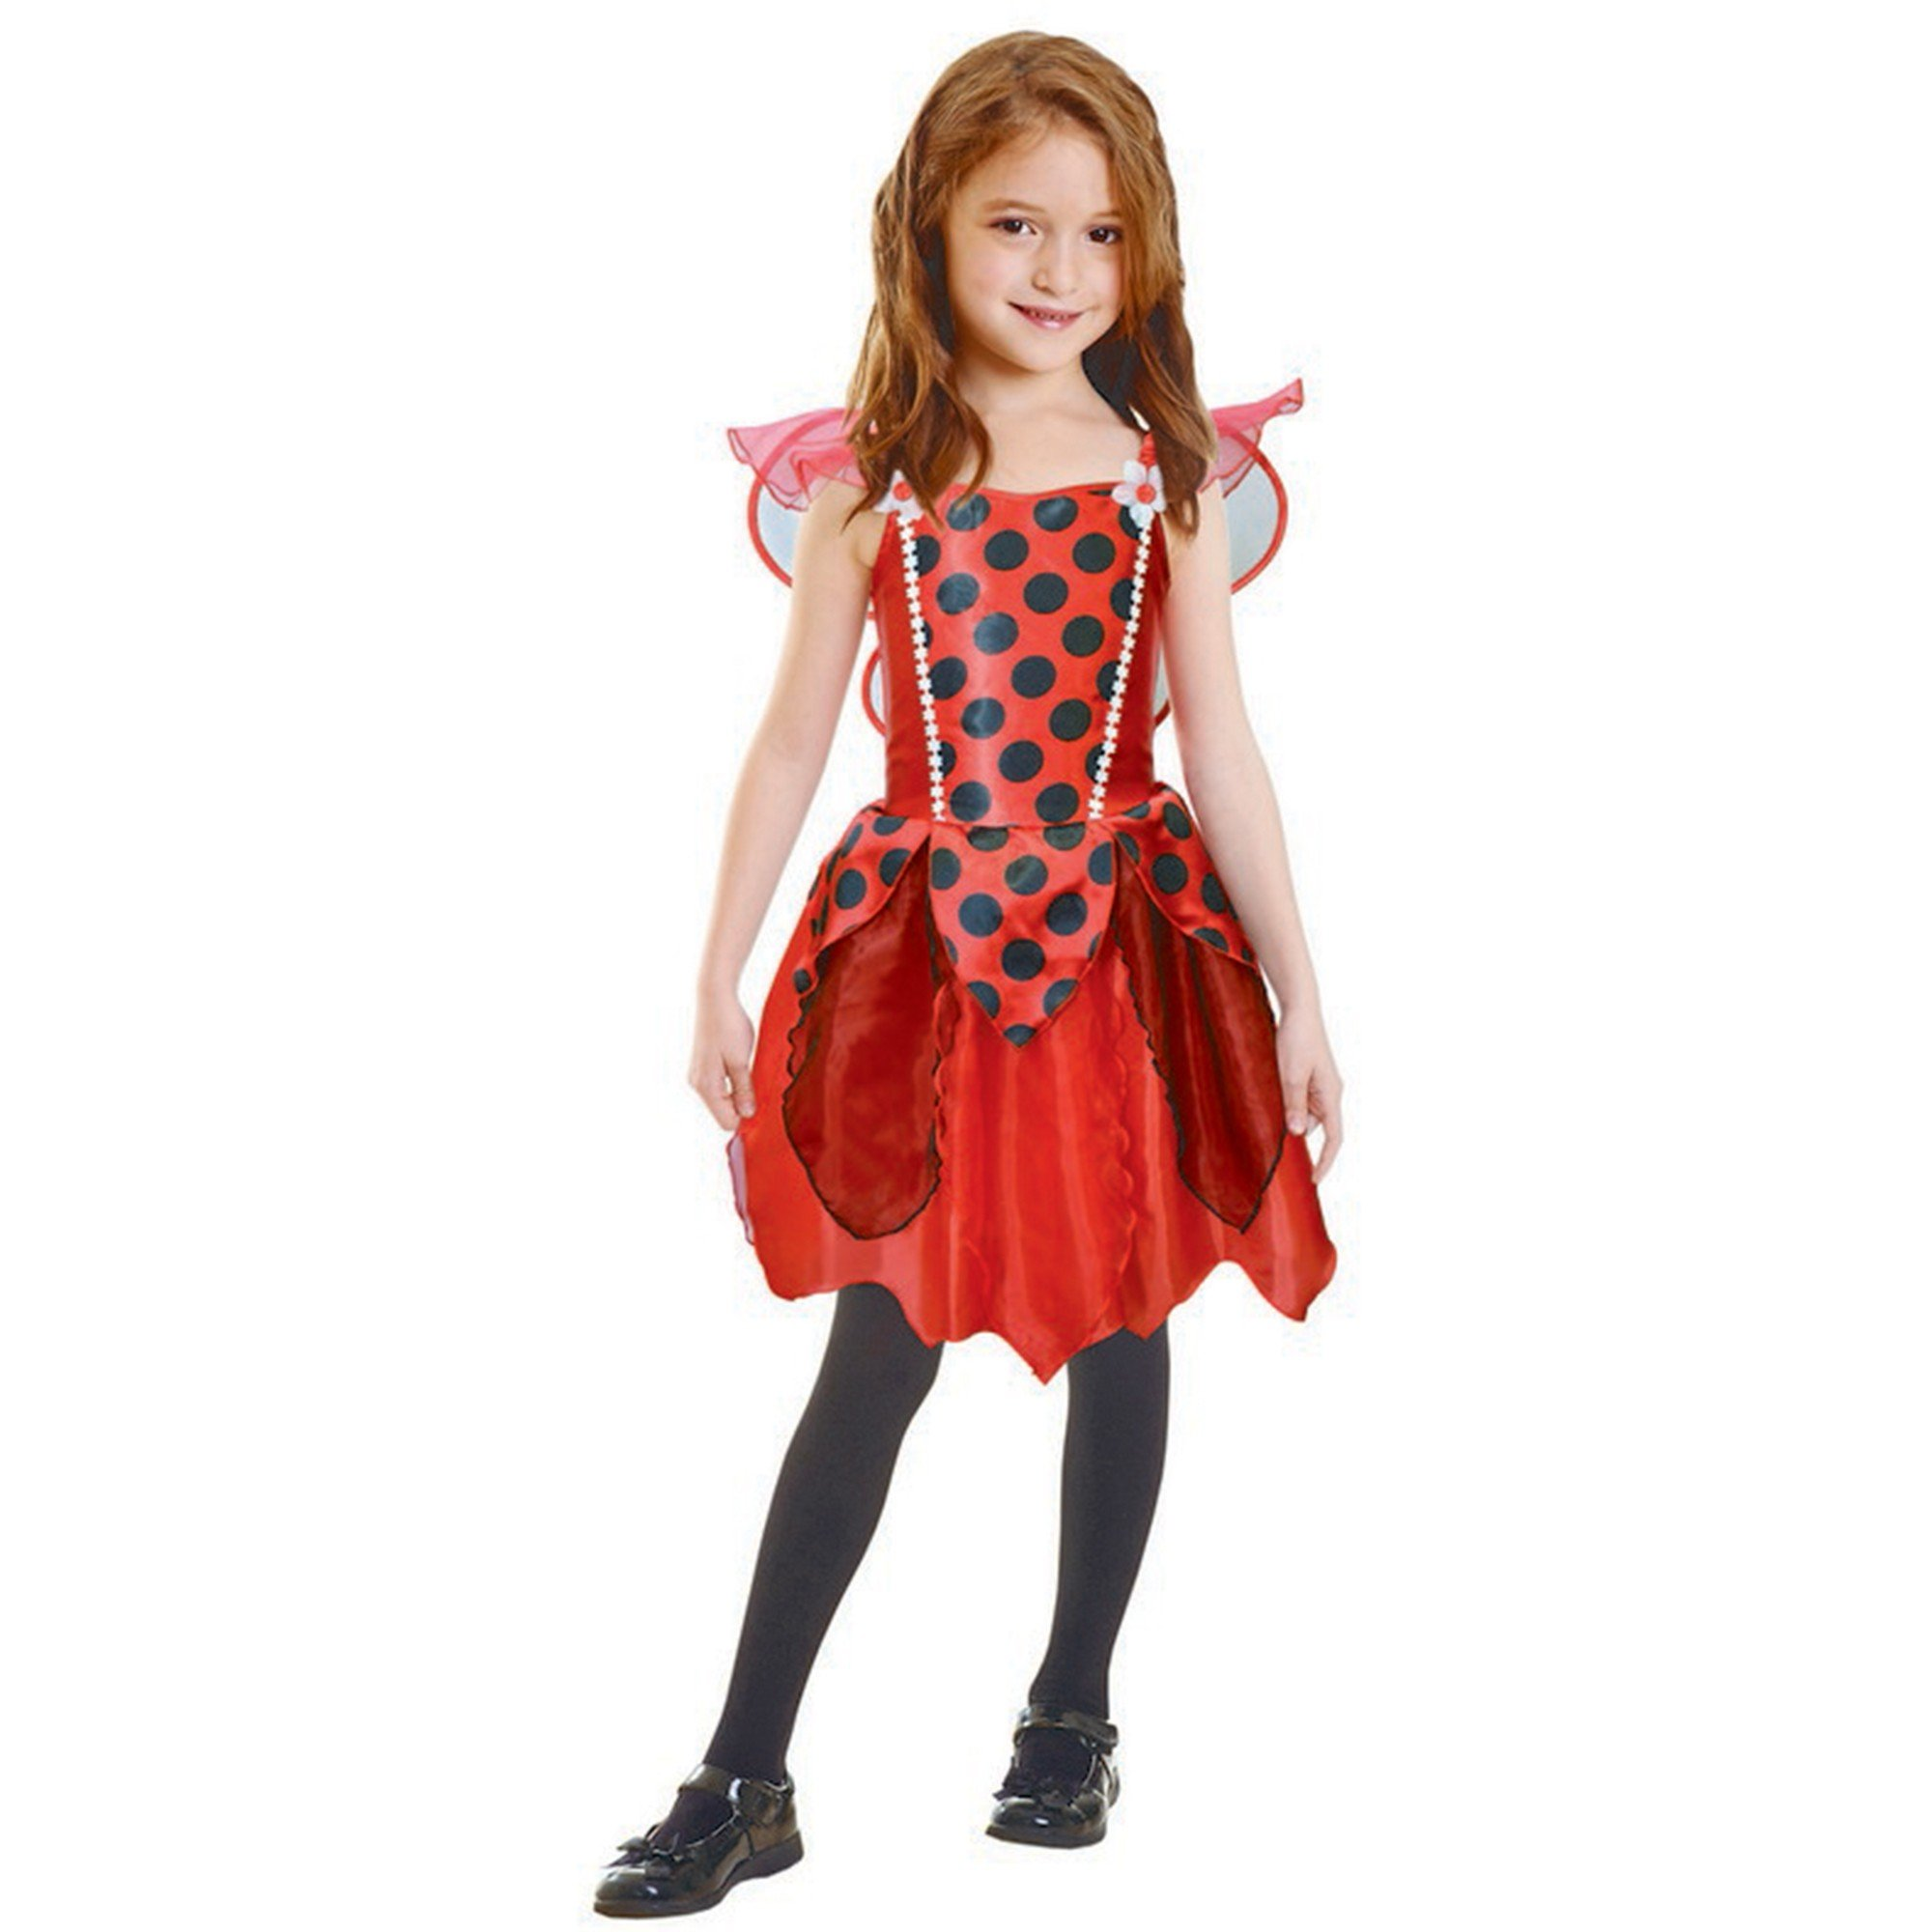 Lady Bug Girl Costume (Small) 3-5 yrs